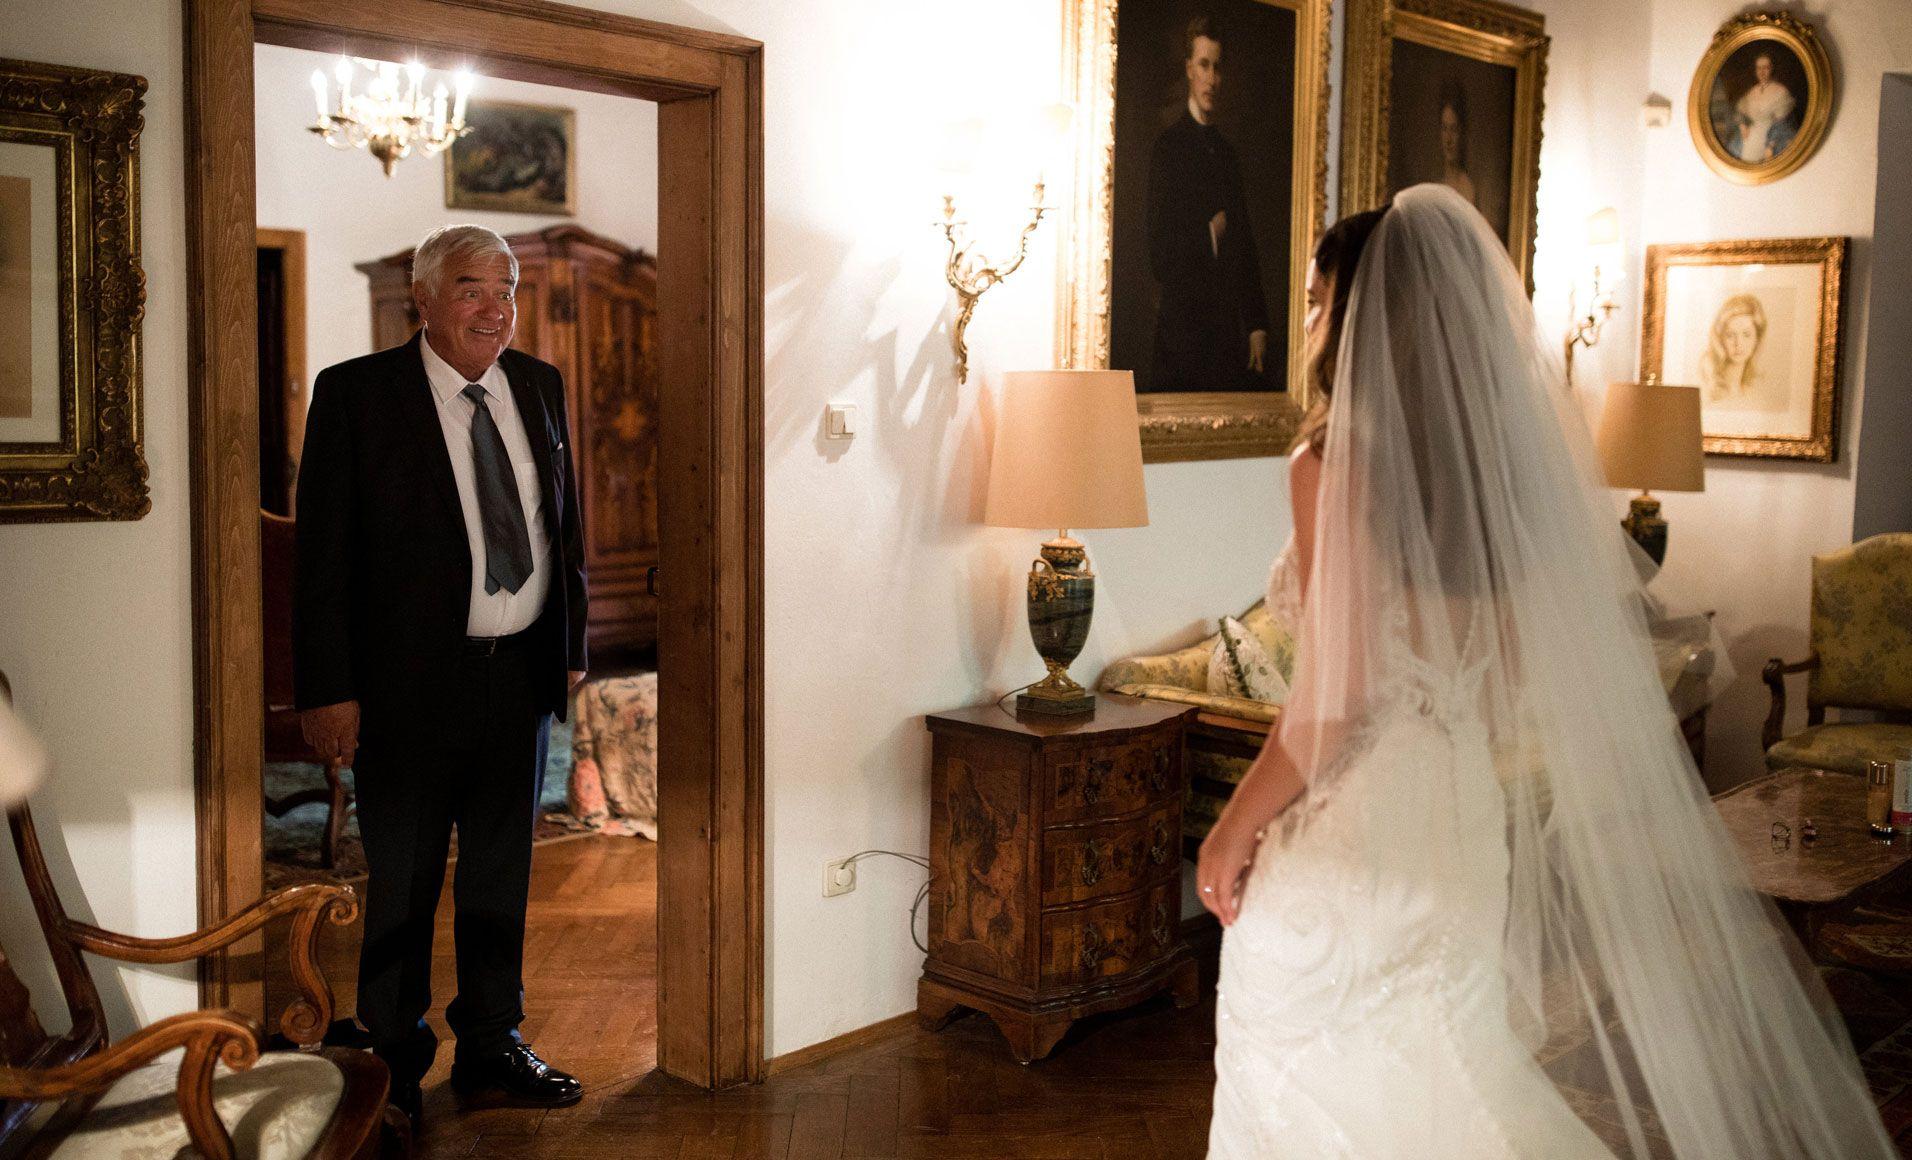 Weddings By Wedding Designer Hannah Elia In The Dolomites Italy I Hochzeiten In Sudtirol Italien In 2020 Hochzeit Catering Bozen Sudtirol Heiraten